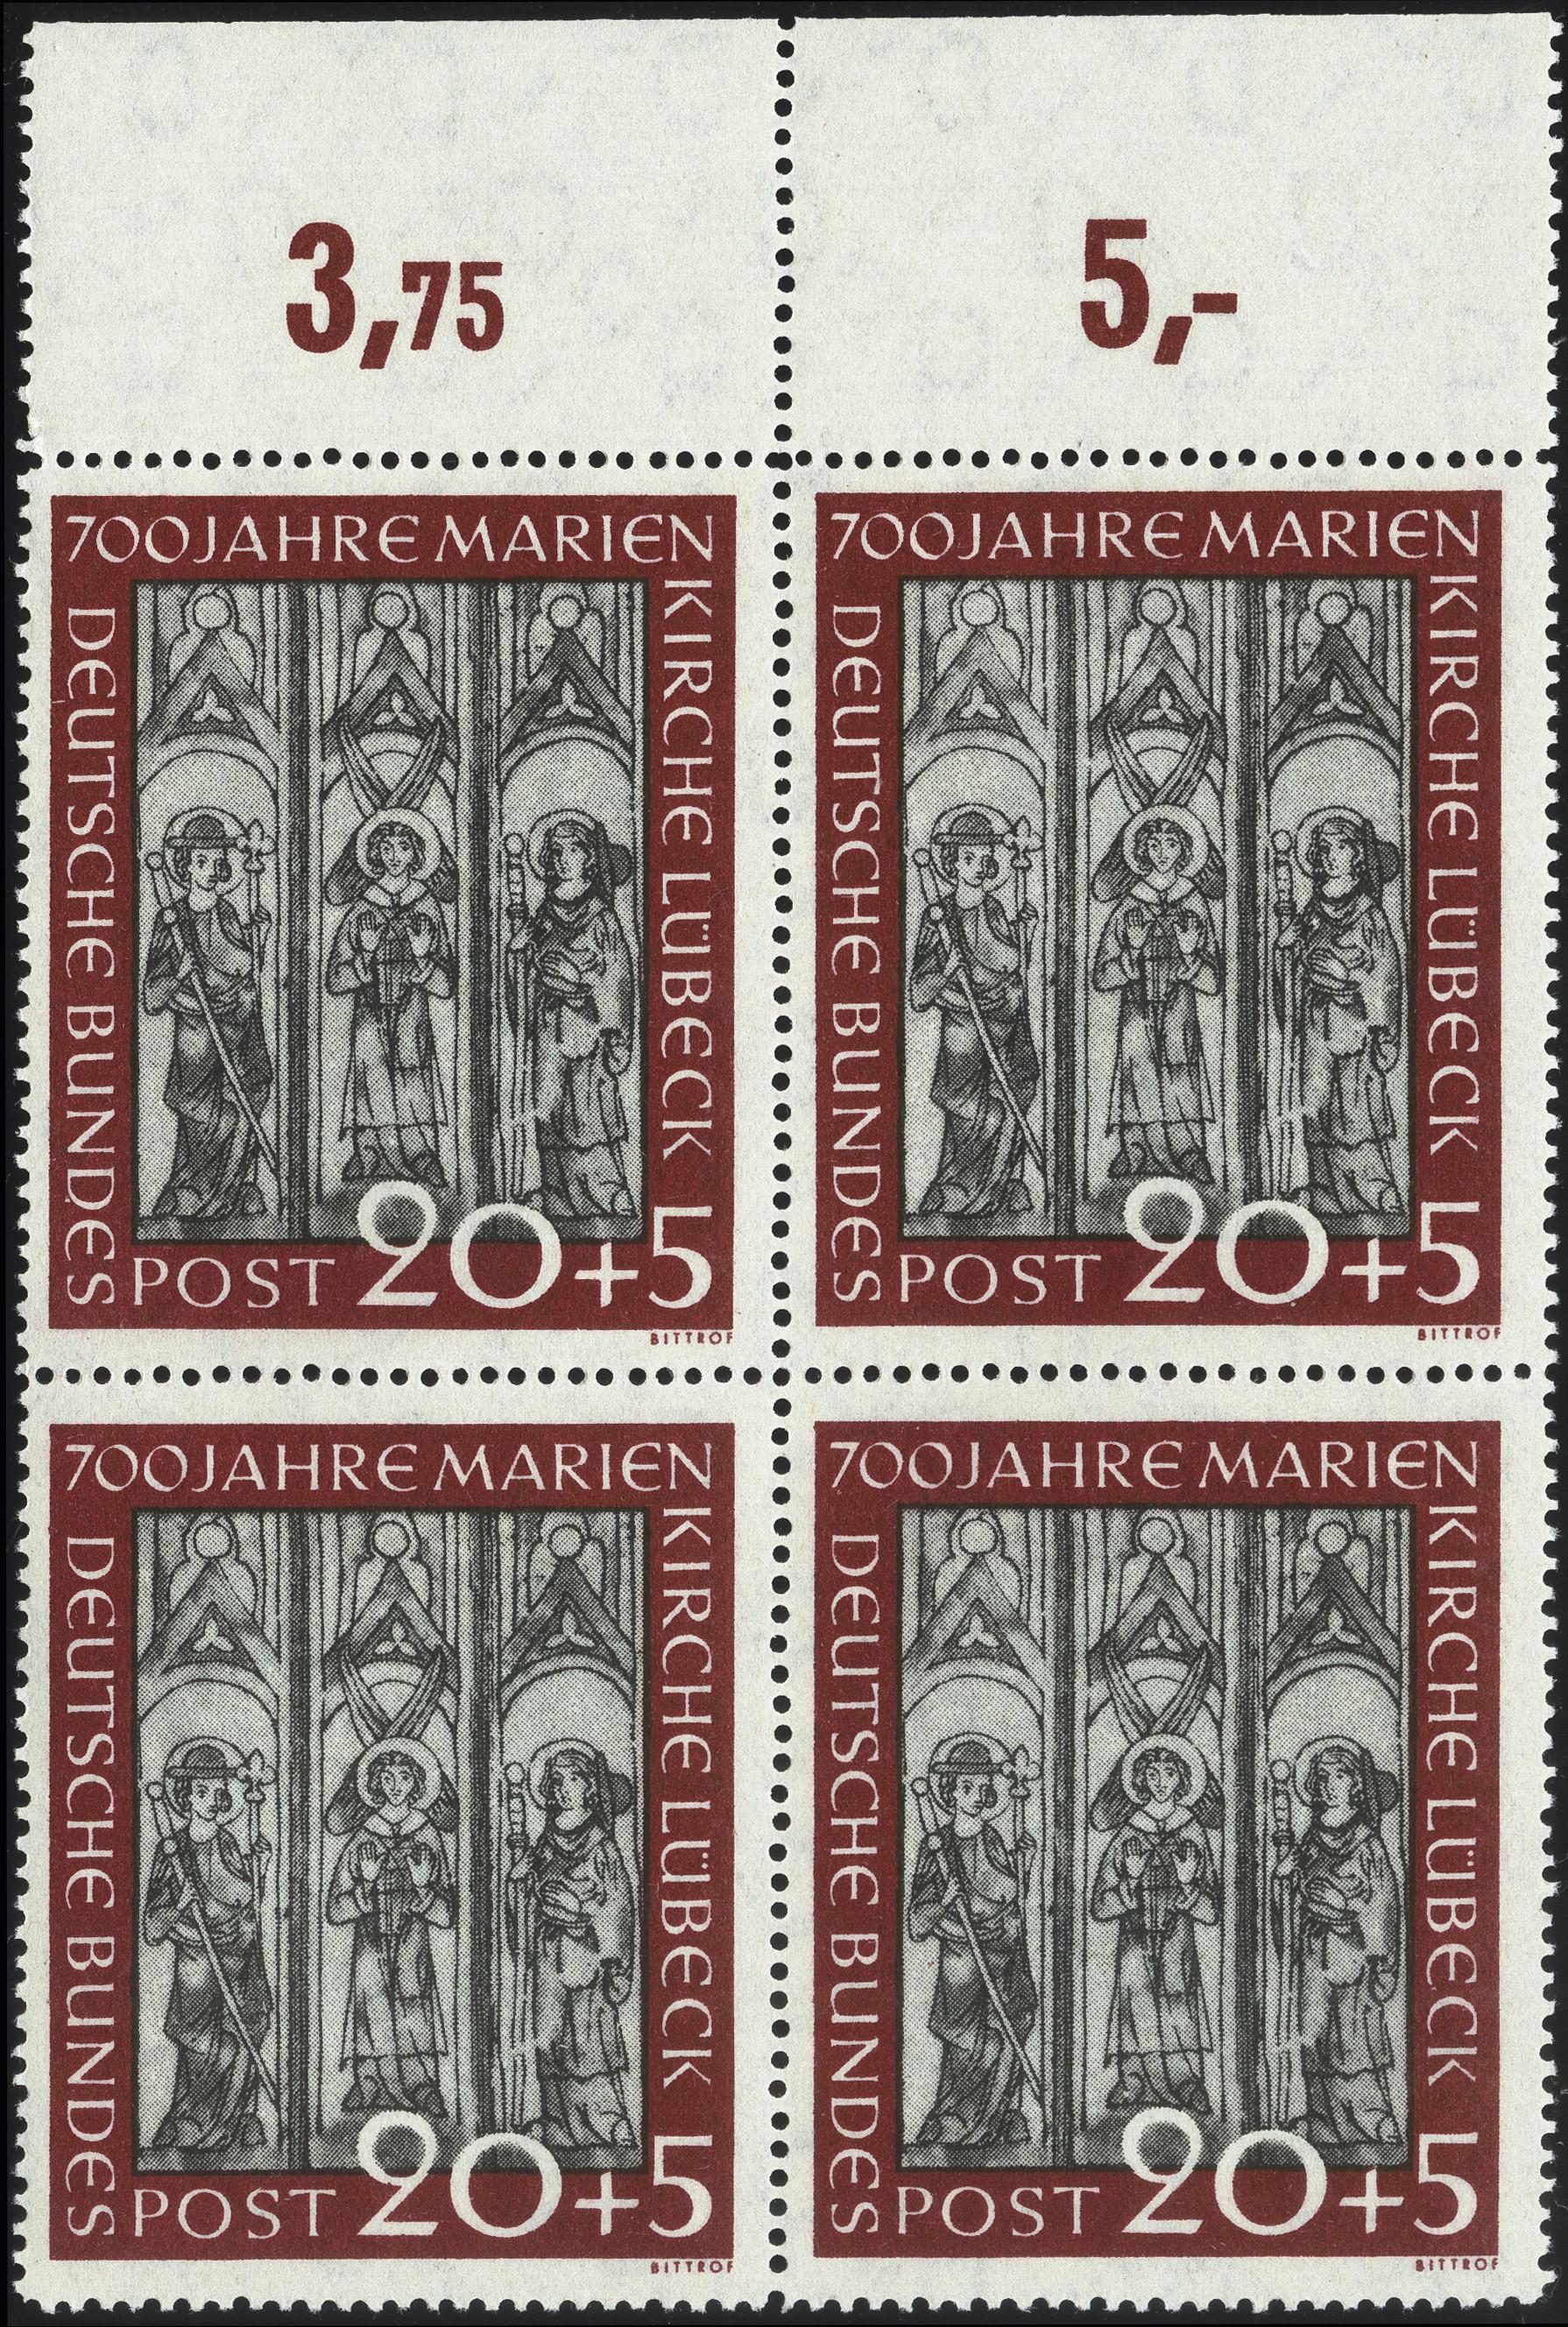 Lot 2846 - germany after 1945 federal republic of germany -  Heinrich Koehler Auktionen Heinrich Köhler Auction 376 - Day 1